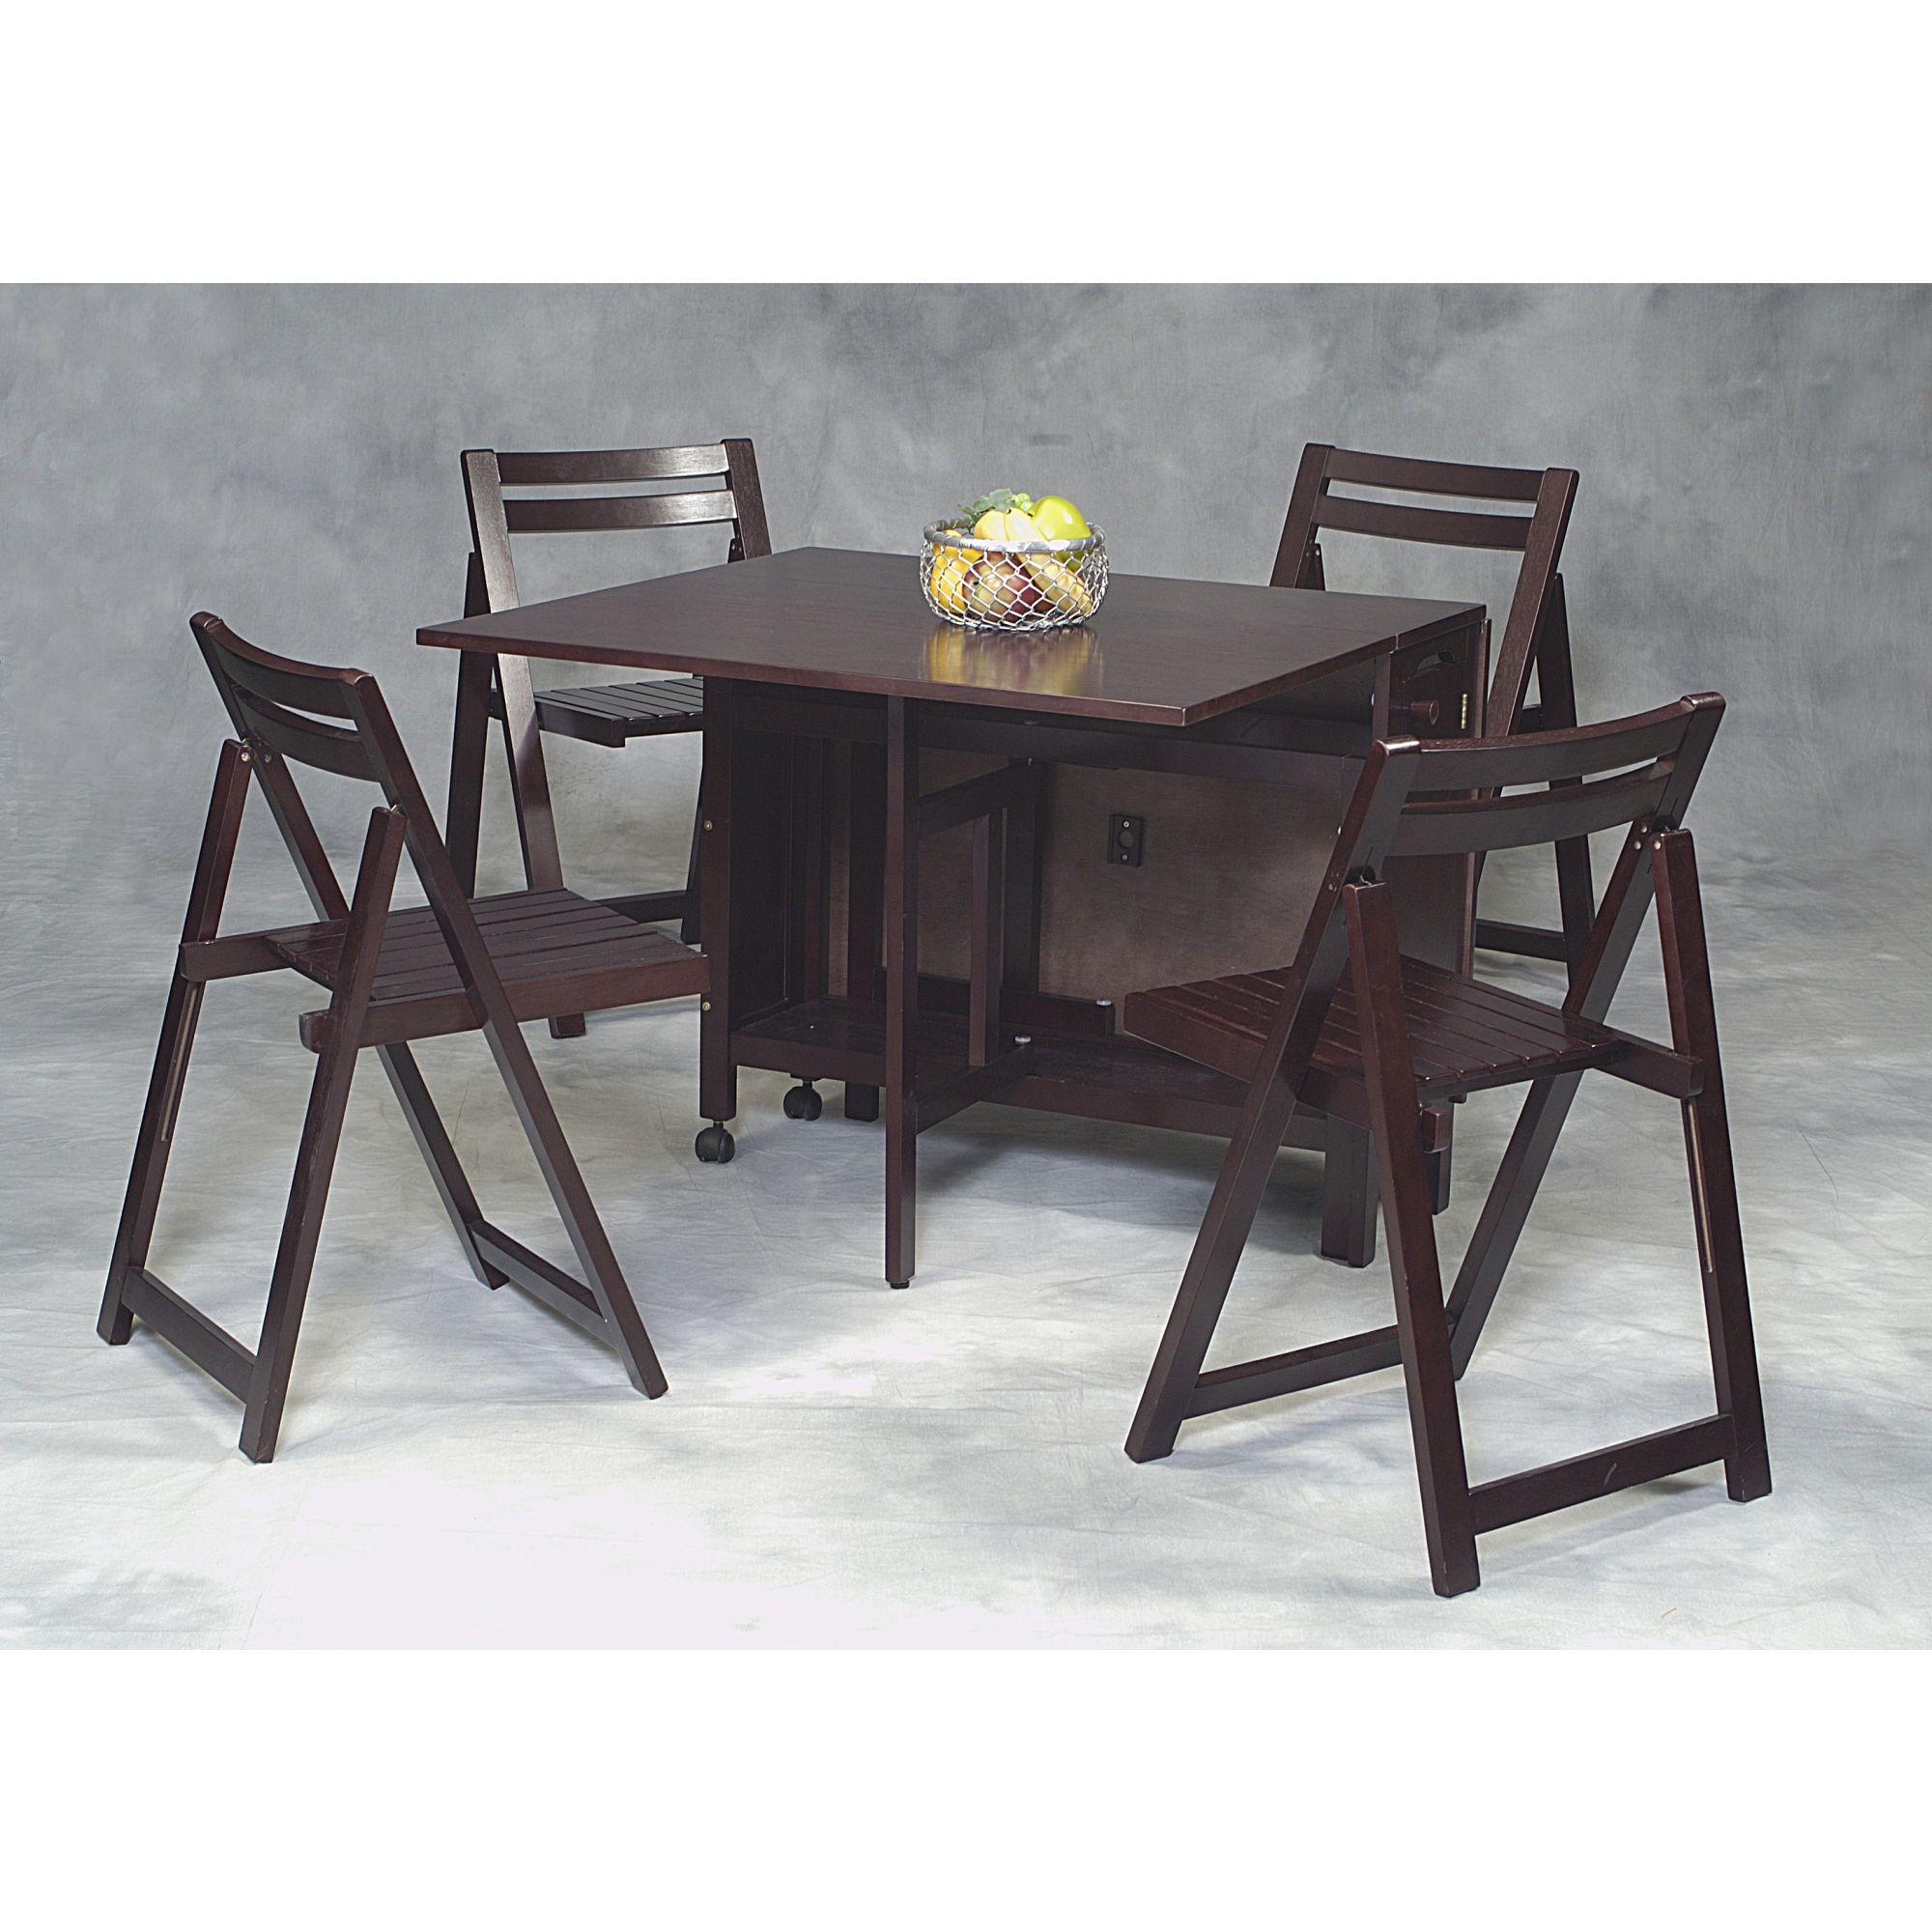 Linon Space Saver  Piece Kitchen Table Set  ORGanized CHaos